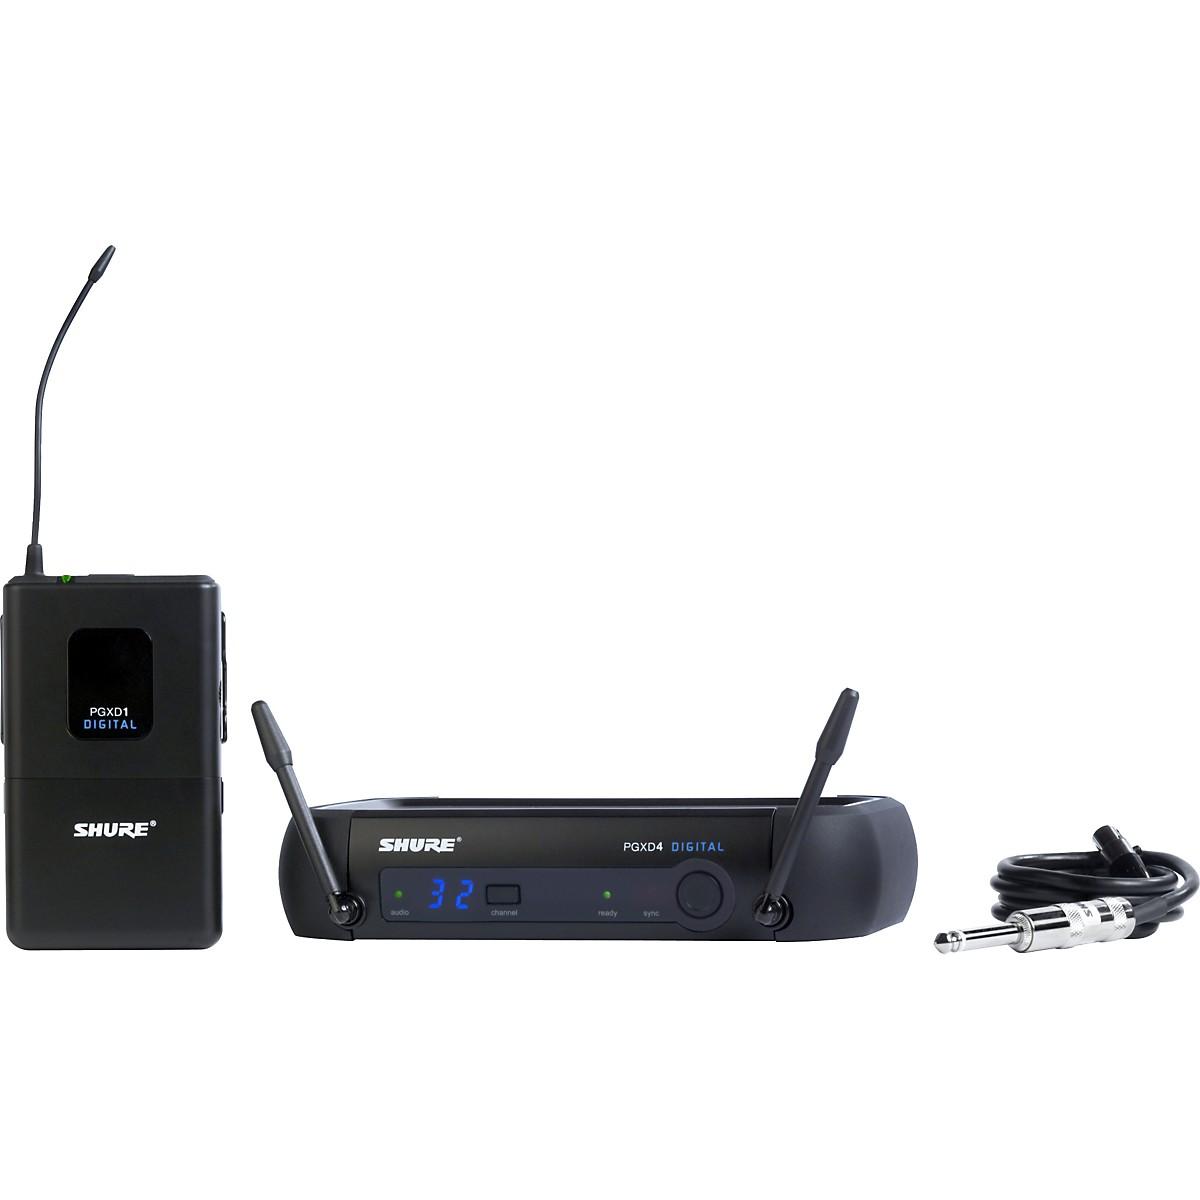 Shure PGXD14 Digital Wireless System for Guitar/Bass